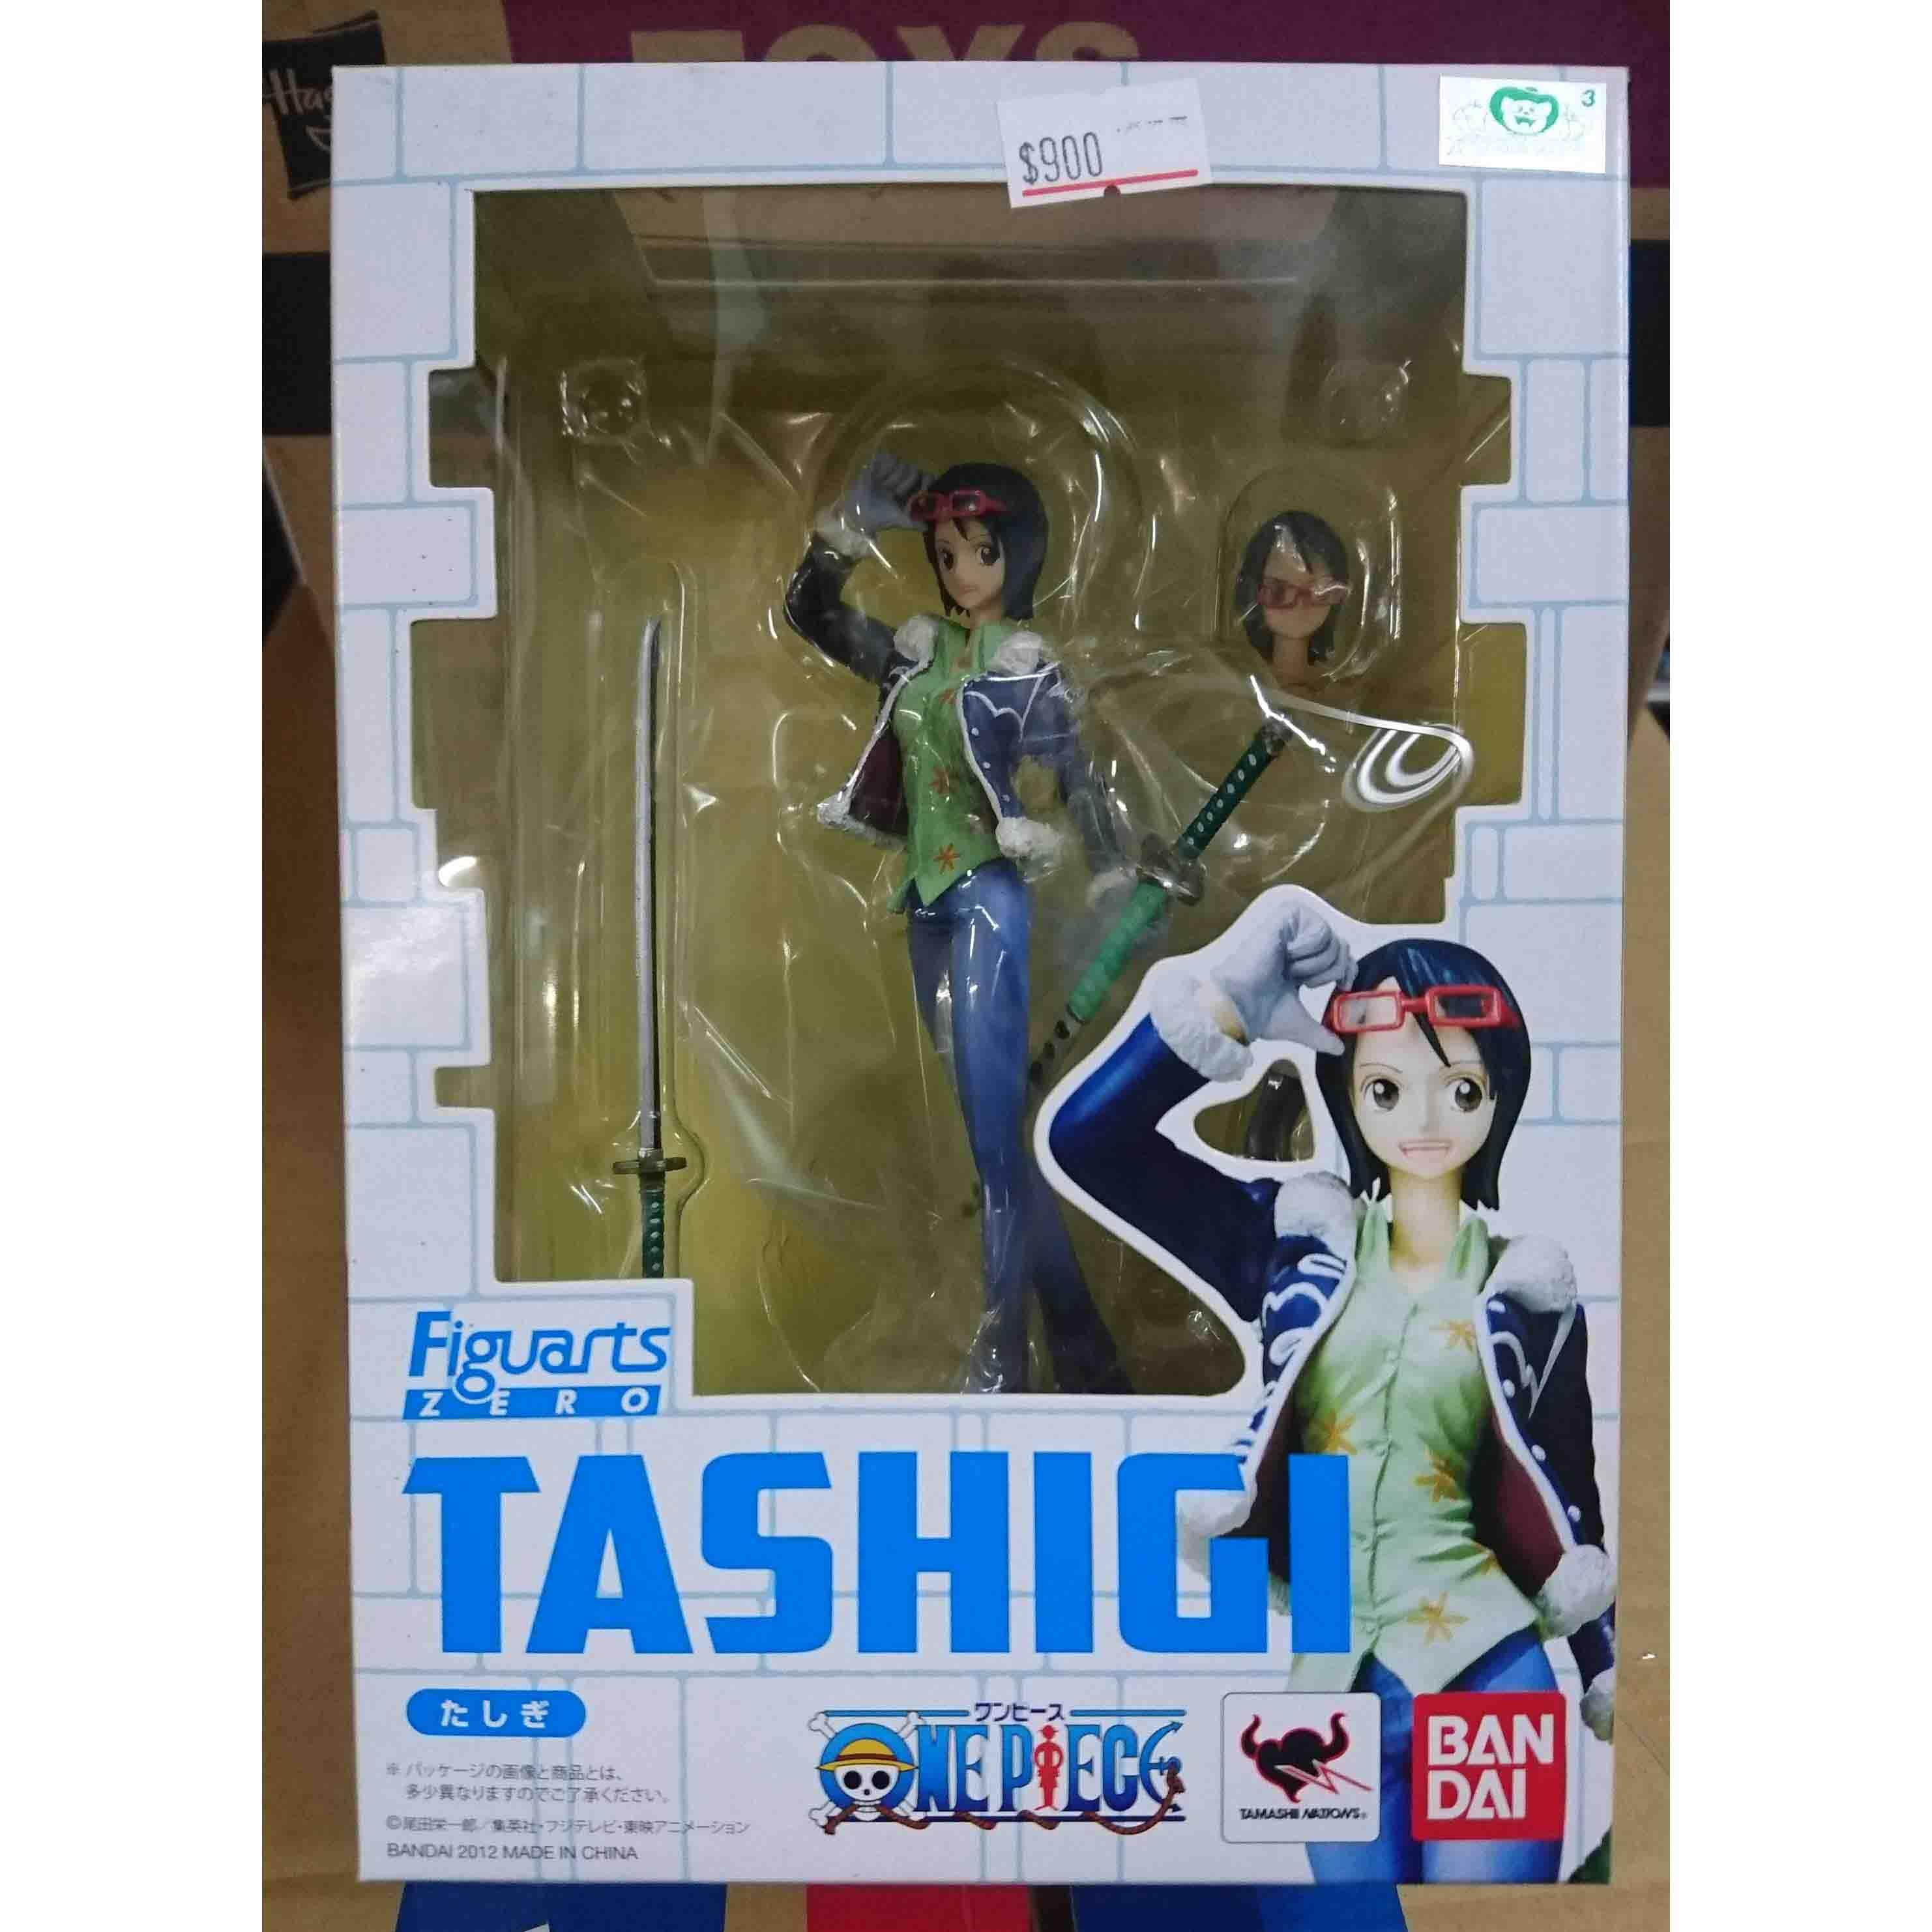 Figuarts Zero 航海王 達斯琪 TASHIGI,益祥模型玩具外盒實拍照片。